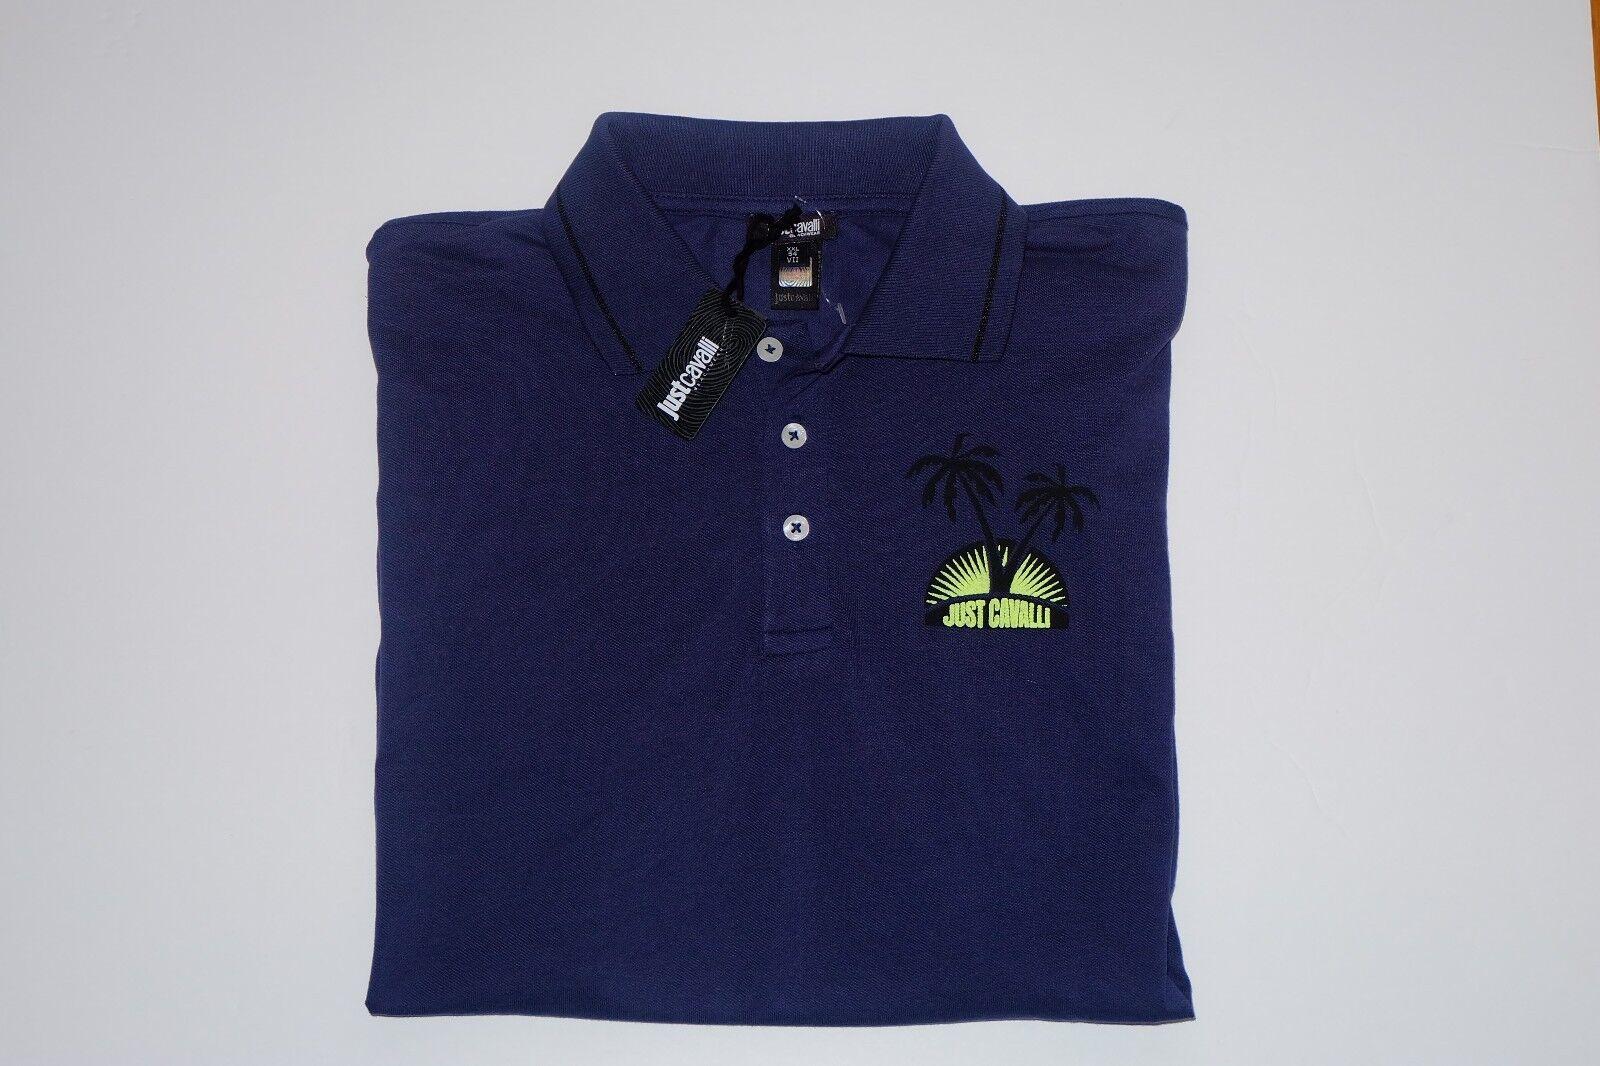 NWT AUTHENTIC Just Cavalli Beachwear Polo Shirt, XXL (54)